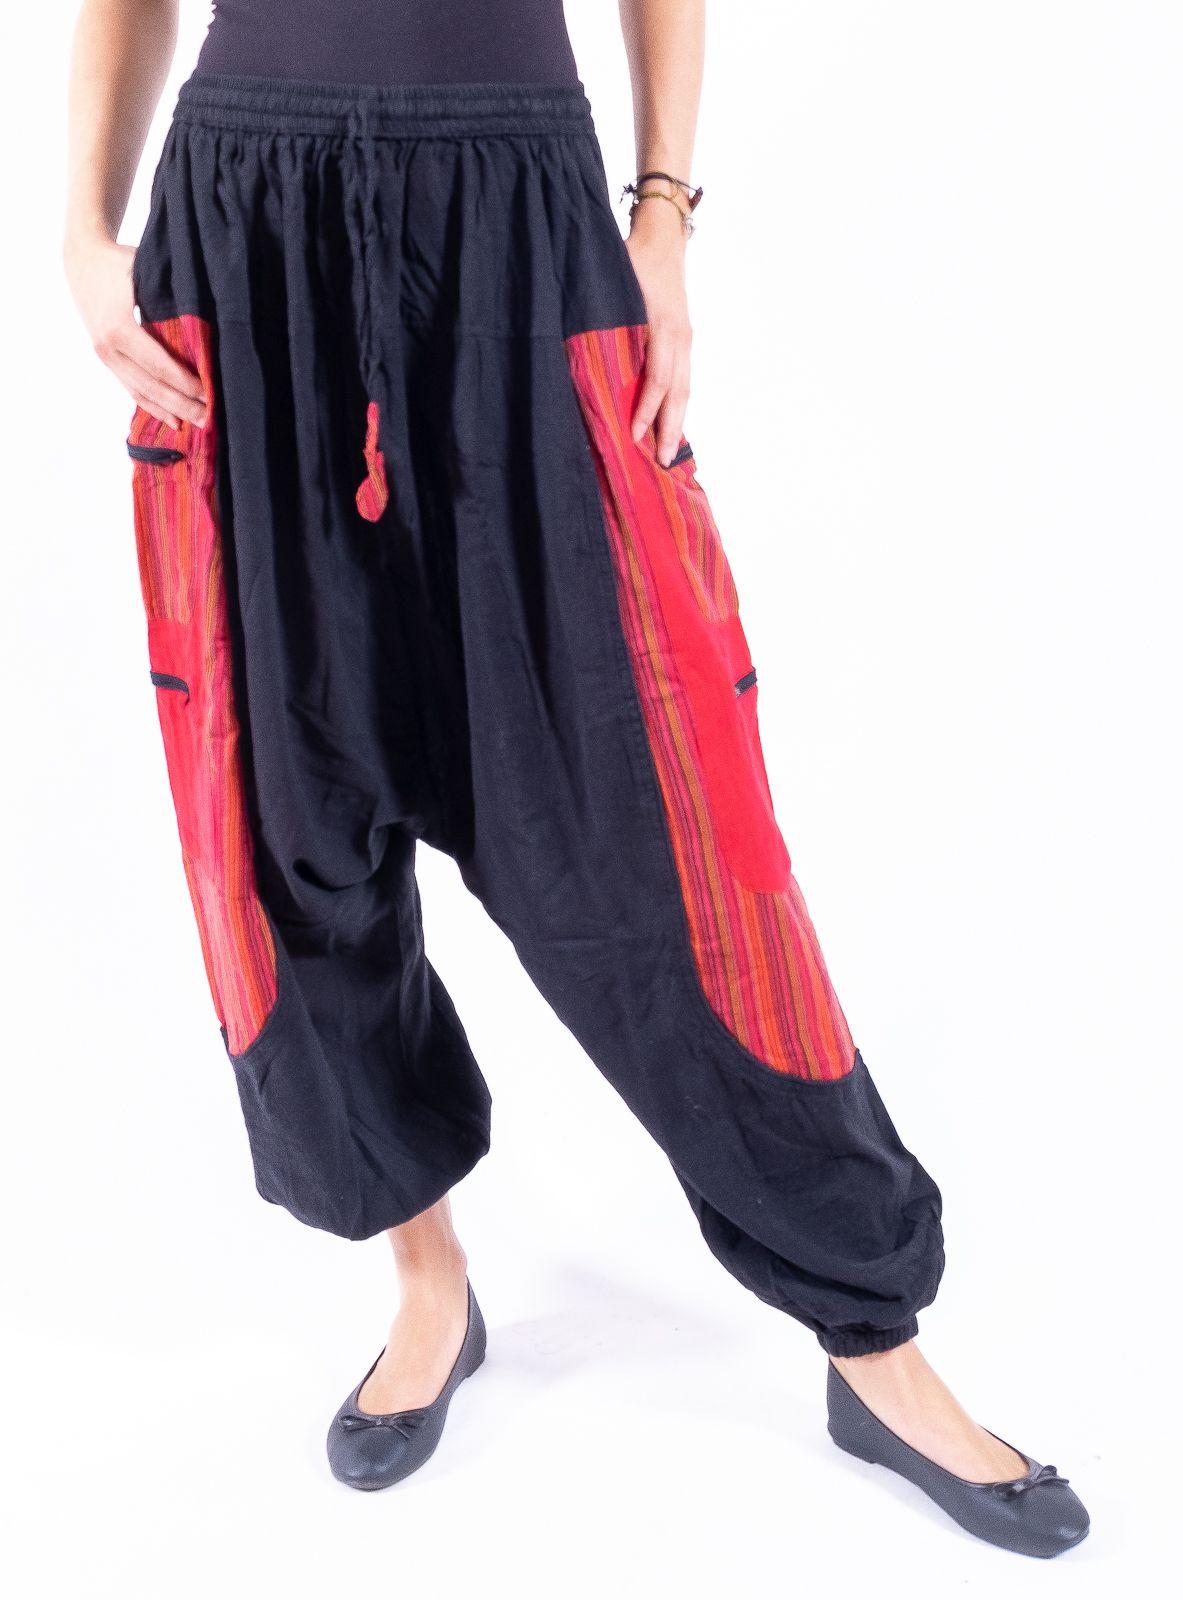 UNISEX turecké kalhoty RAMA z Nepálu z lehčího materiálu - NT0053-28B-008 KENAVI